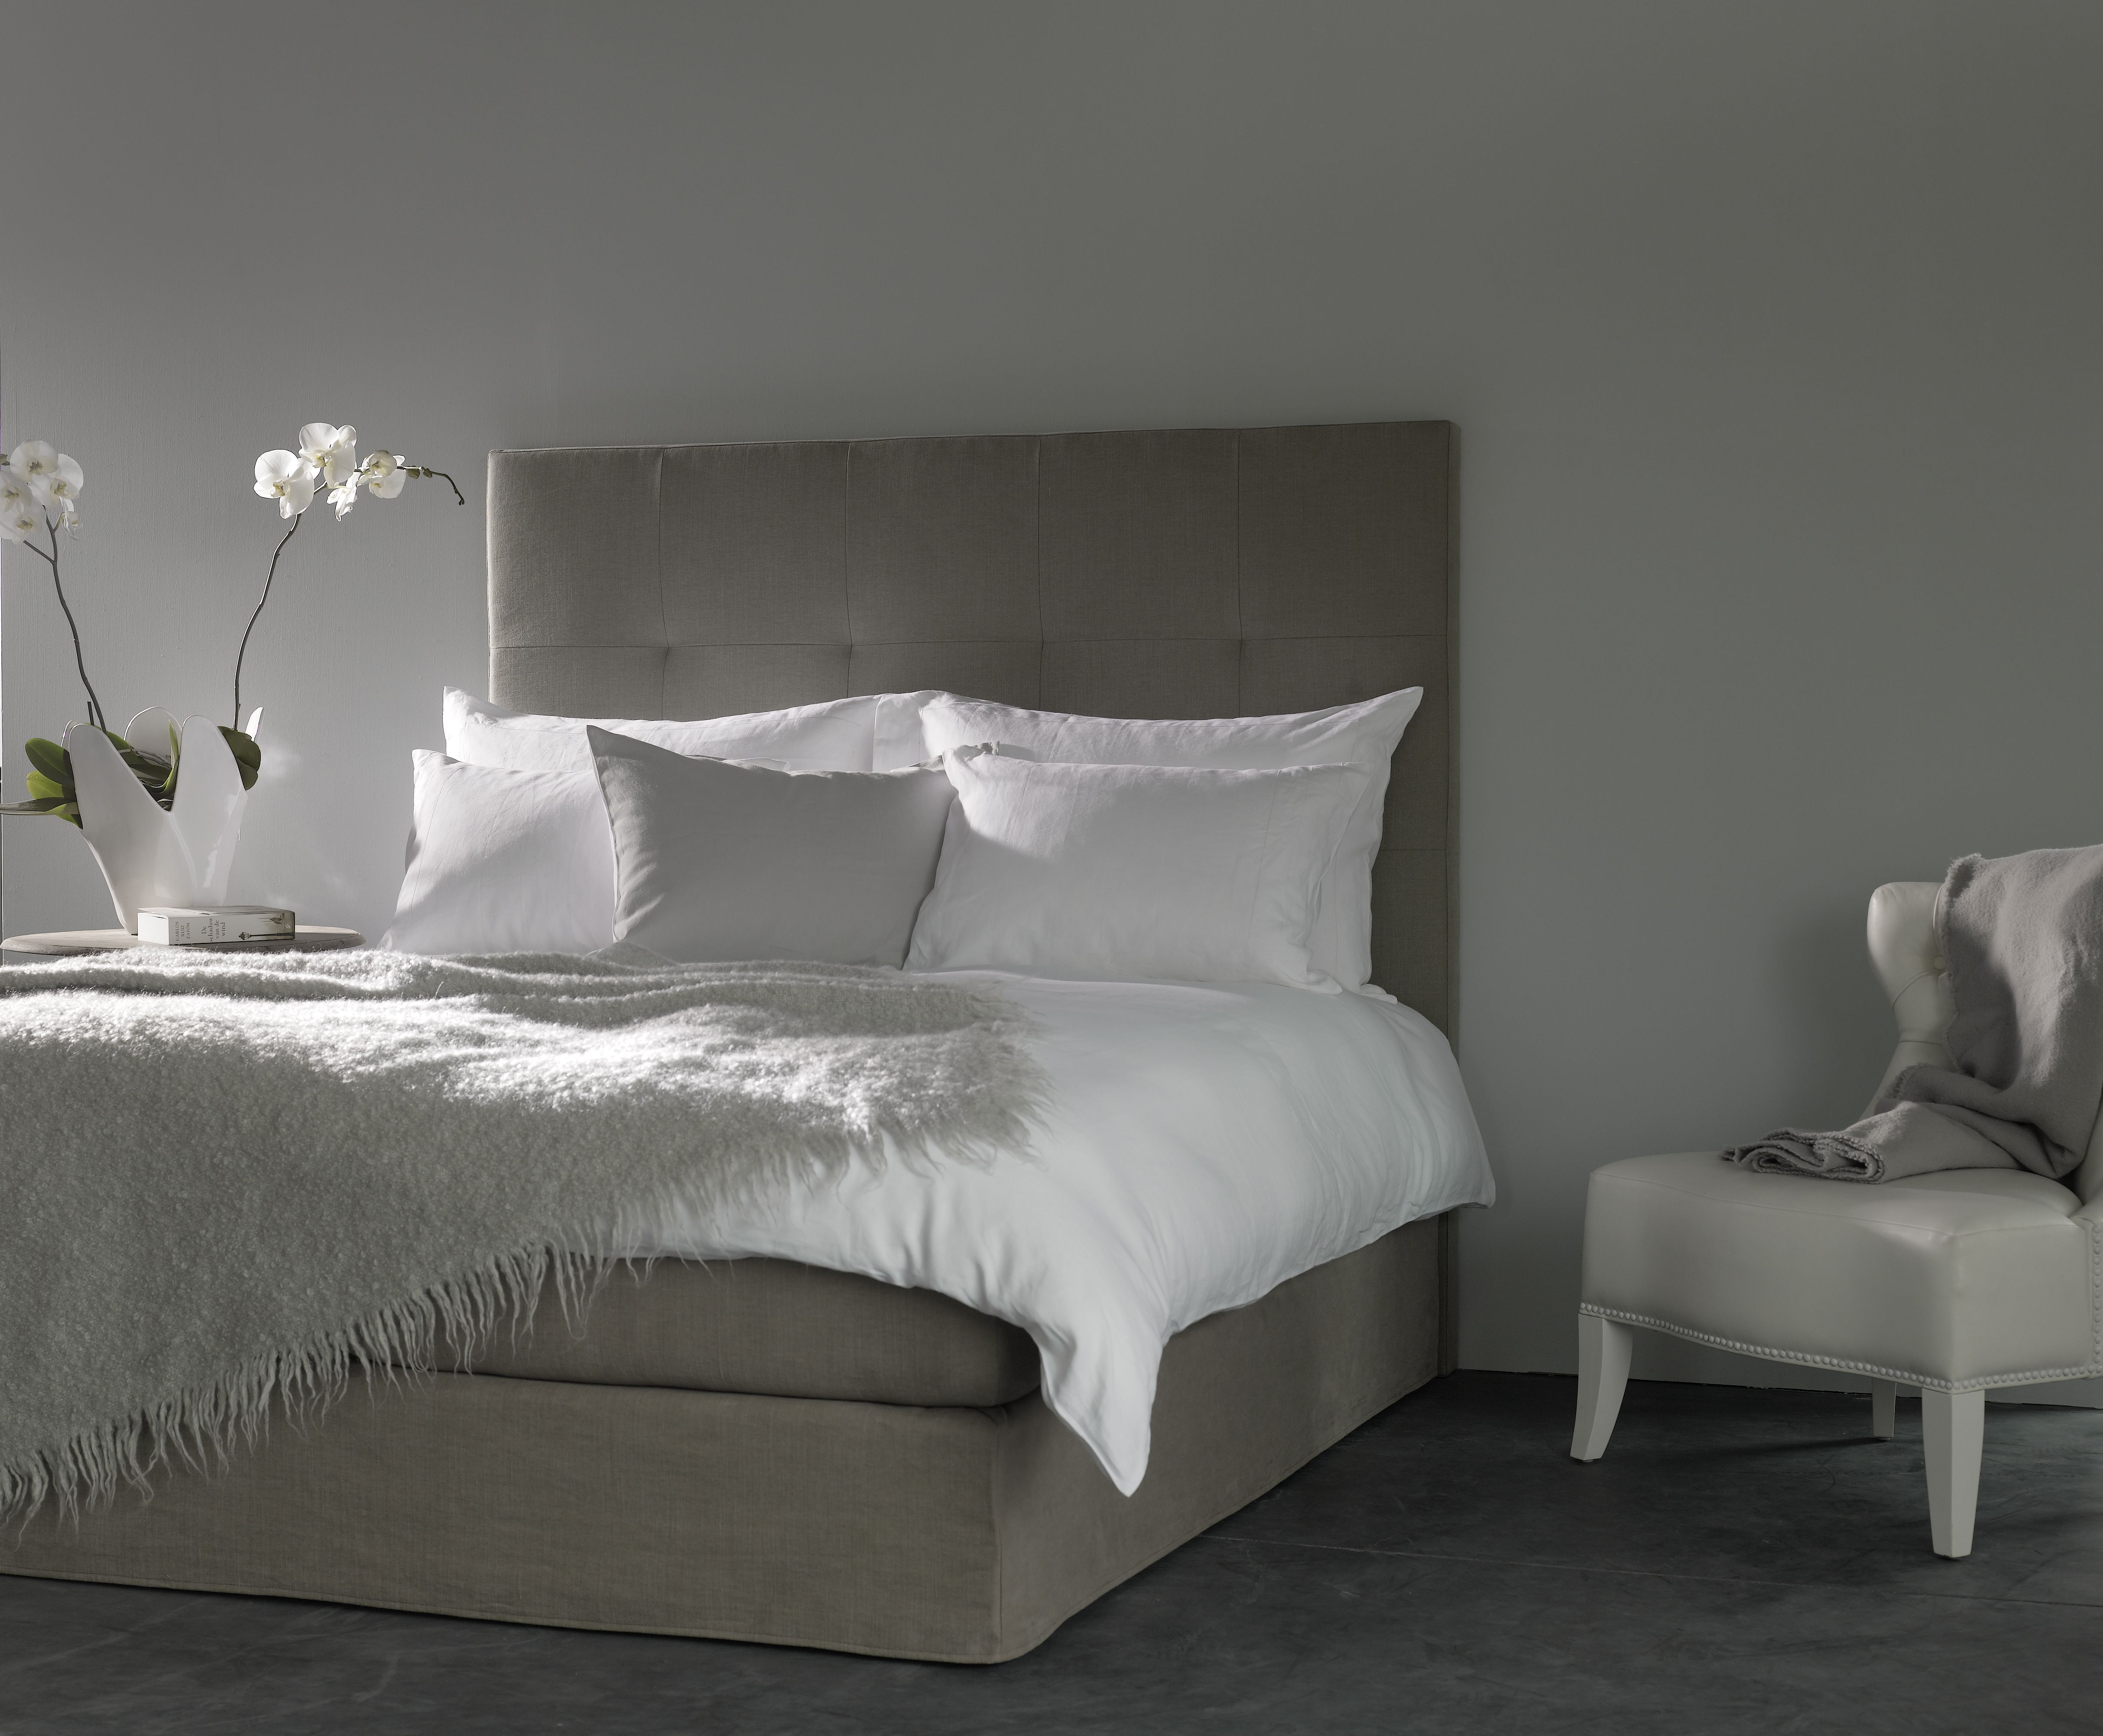 bed sedona, design castello lagravinese | bedrooms | busnelli, Schlafzimmer entwurf